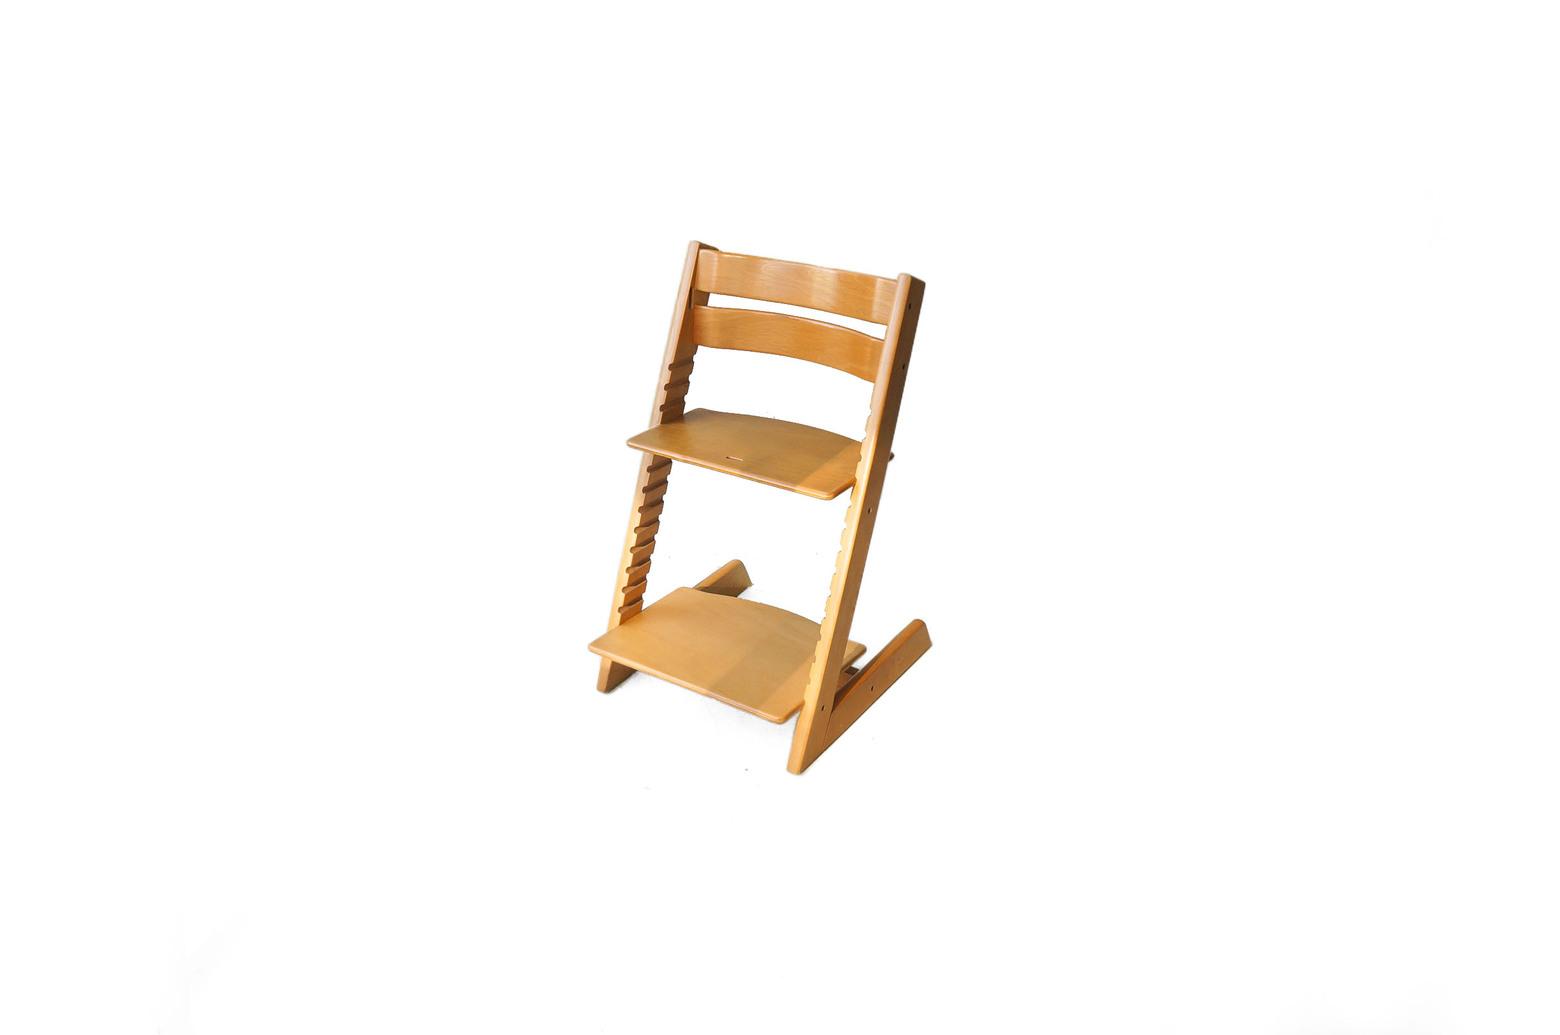 STOKKE TRIPP TRAPP Baby Chair Natural/ストッケ トリップトラップ ベビーチェア ハイチェア ナチュラル 旧型 ベビーガード 北欧デザイン